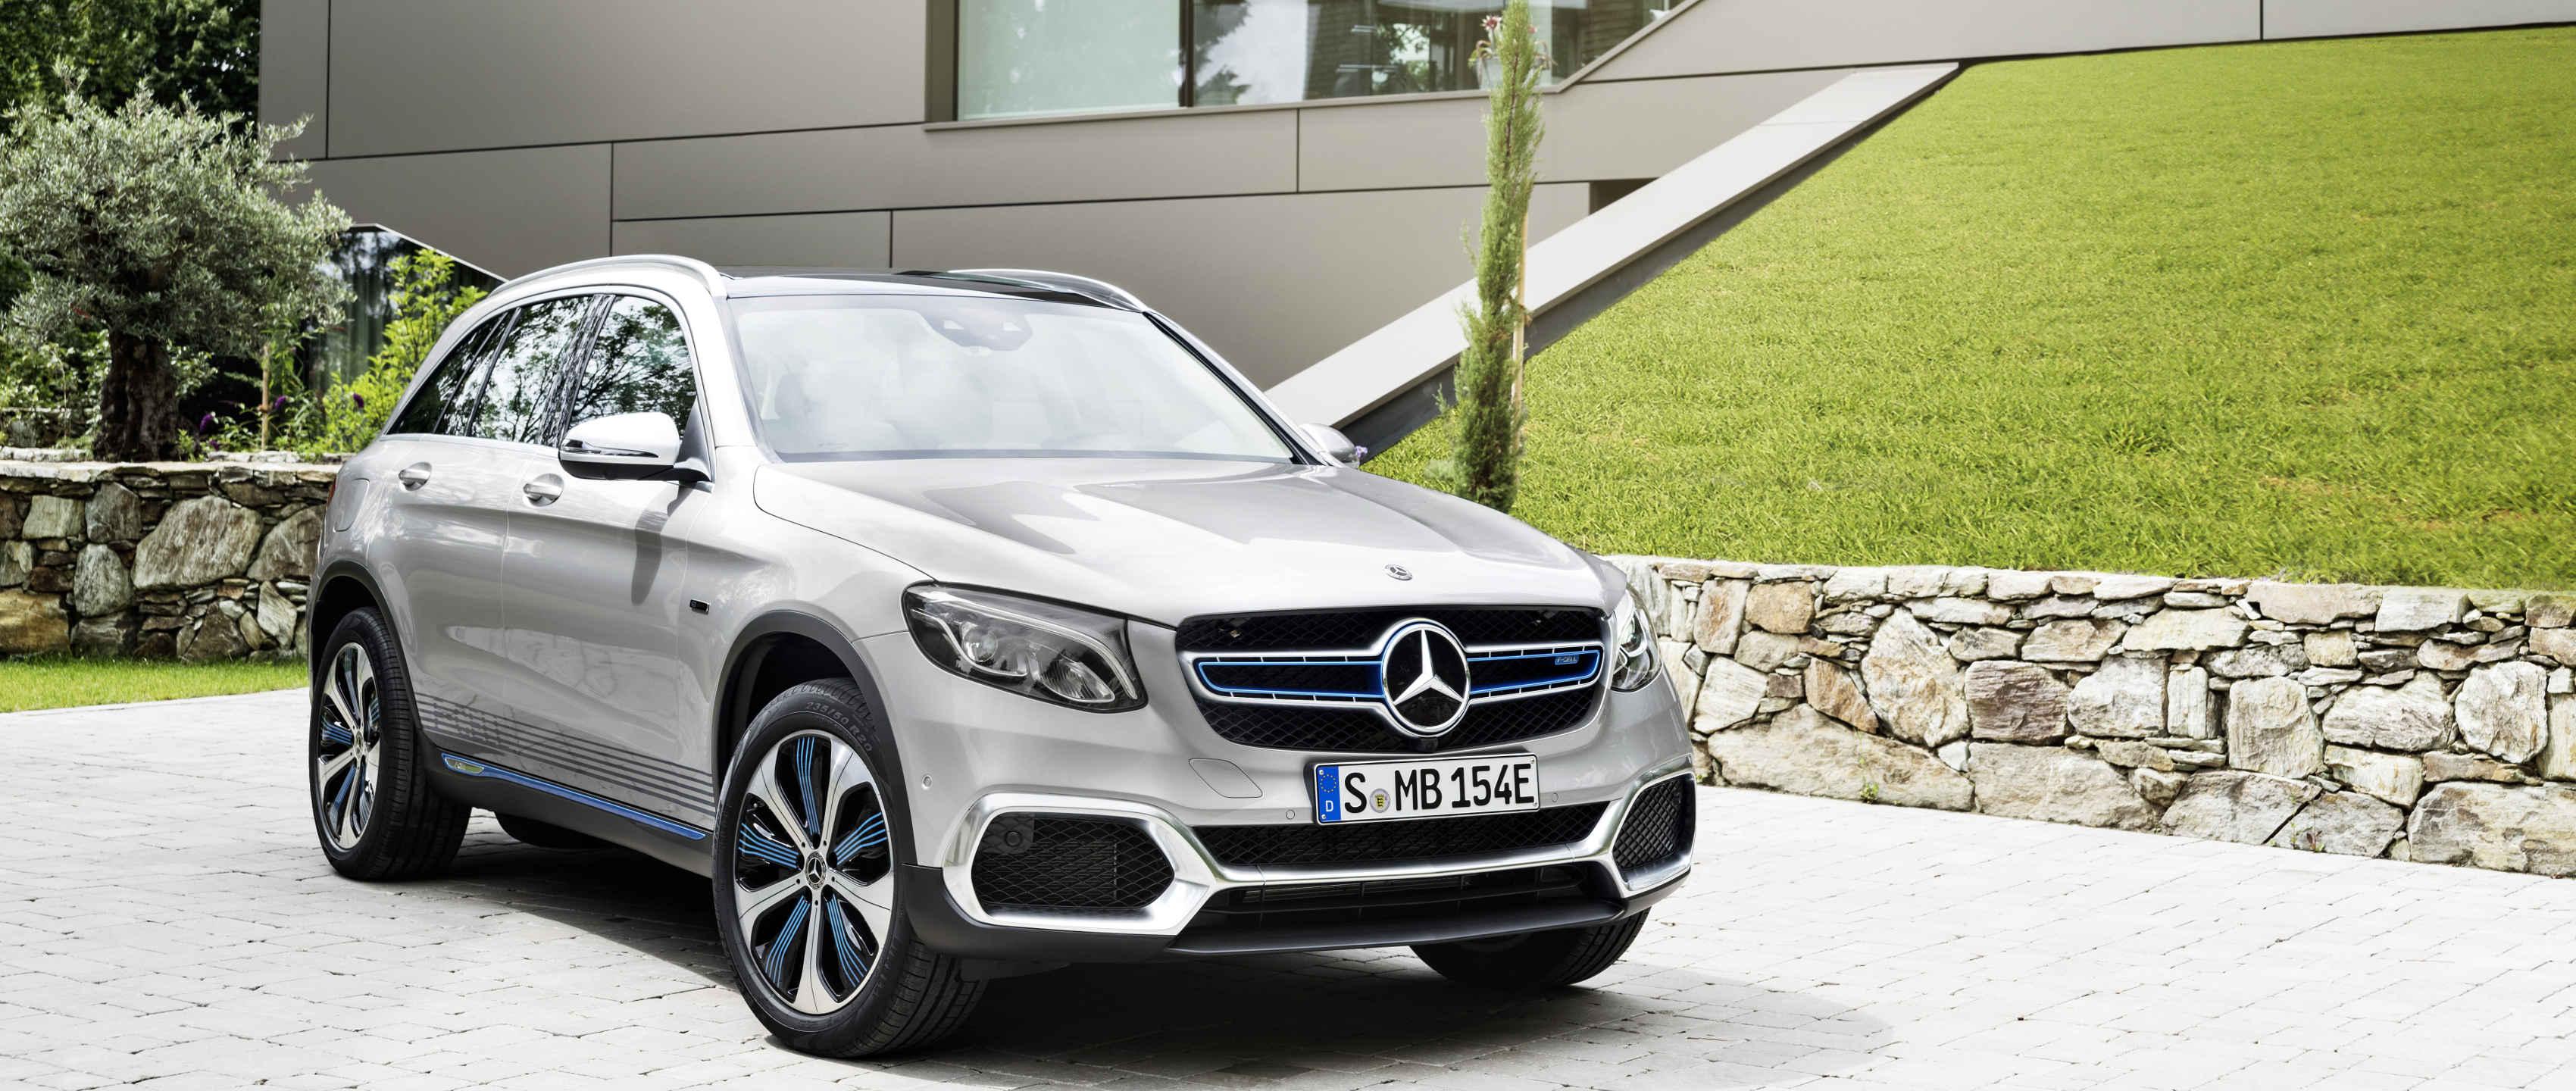 Mercedes – Benz GLC F-Cell